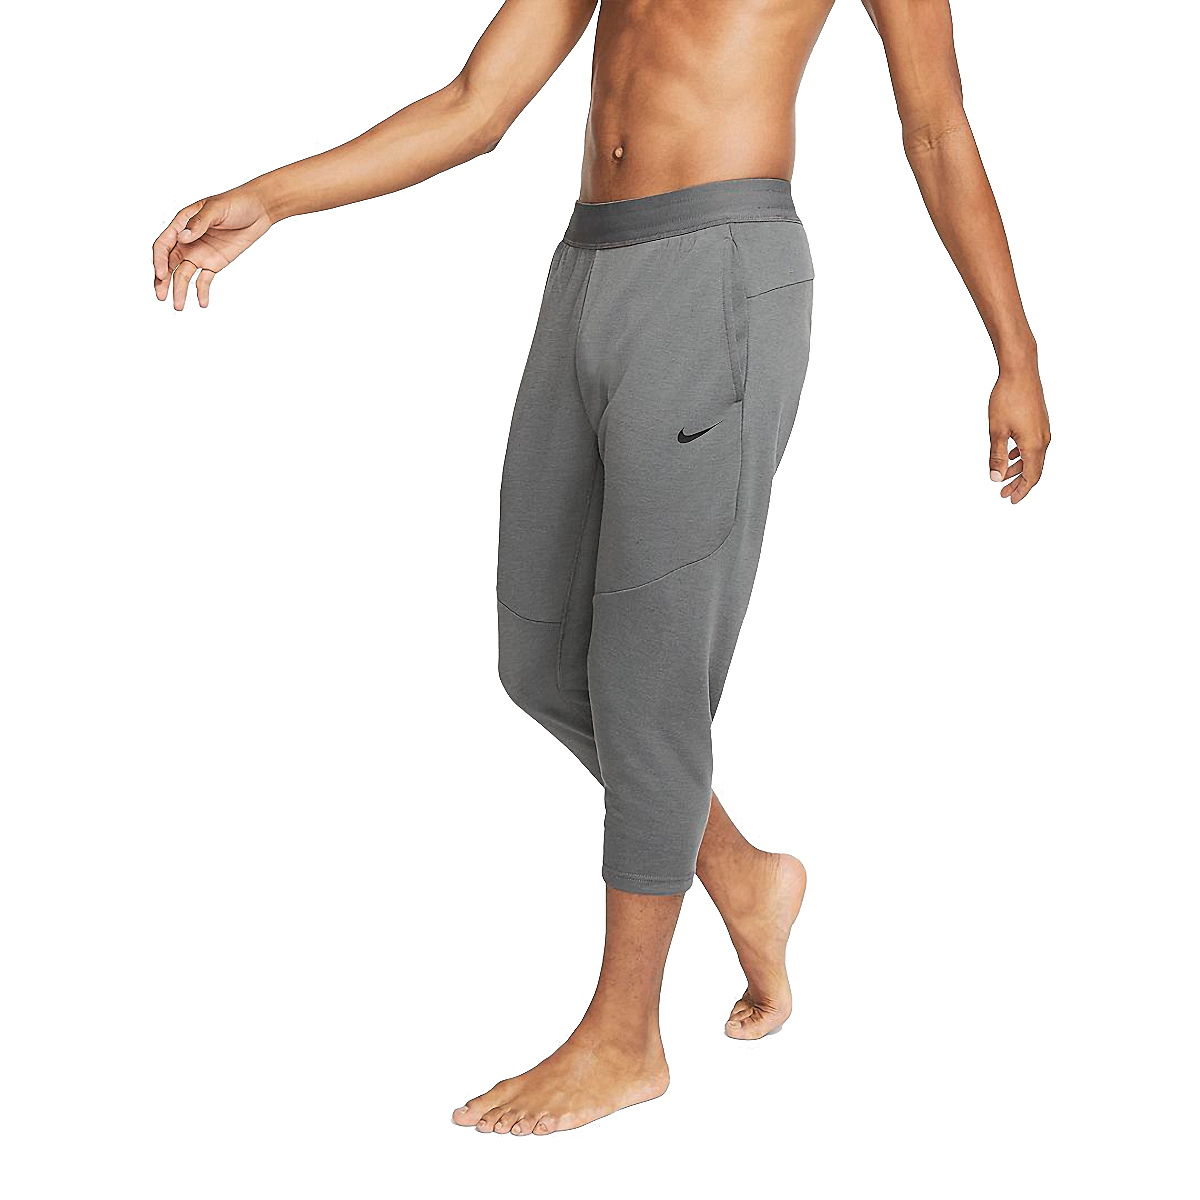 Artes literarias General Electricista  Men's Nike Dri-Fit Yoga Pant   JackRabbit